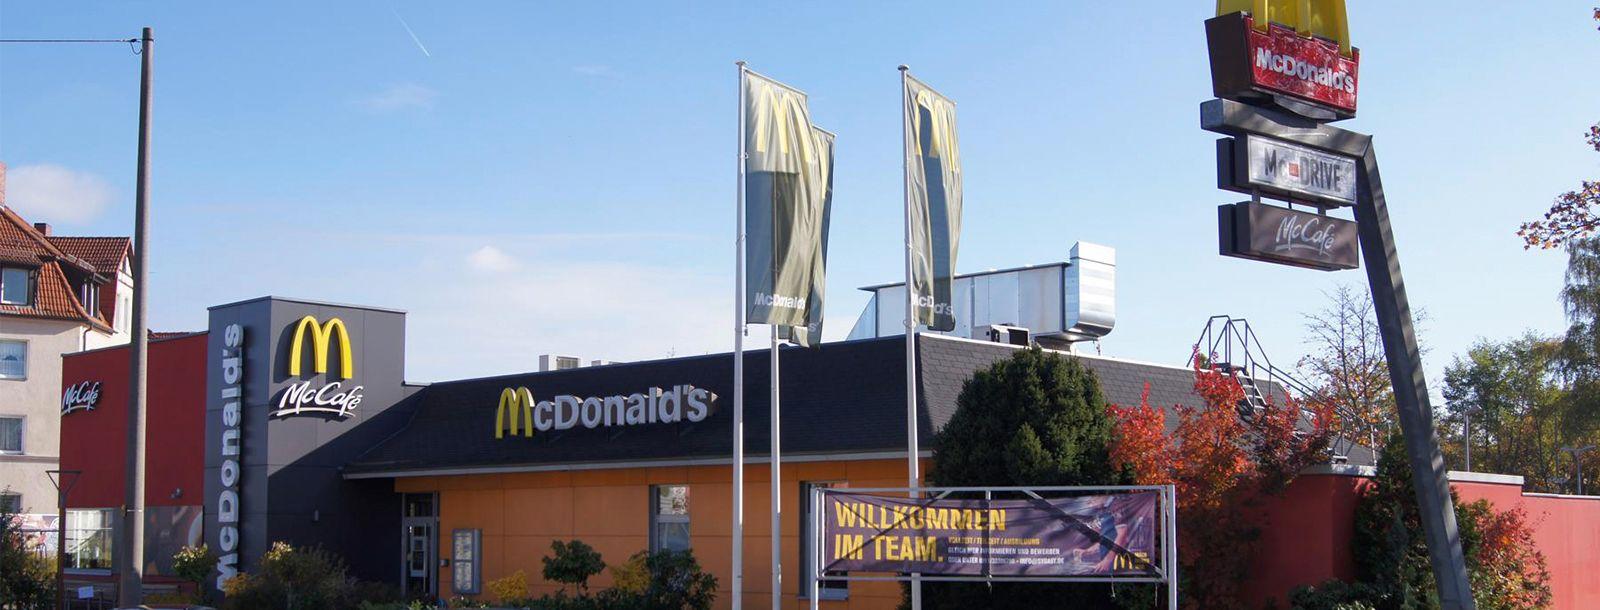 Nrnberg_Laufamholzstrasse_1_McDonalds